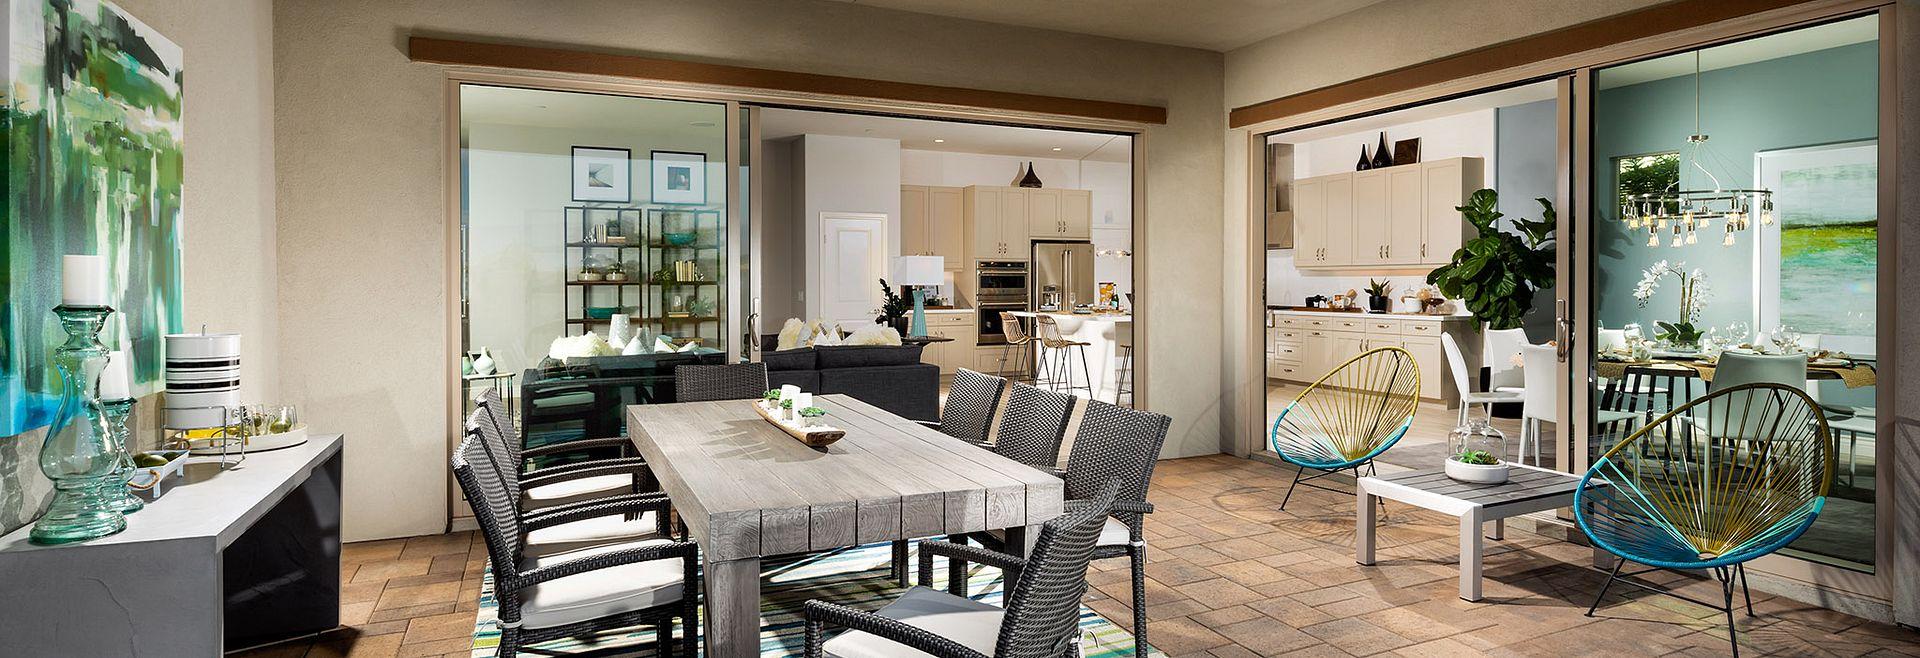 Proclaim Plan Outdoor Room